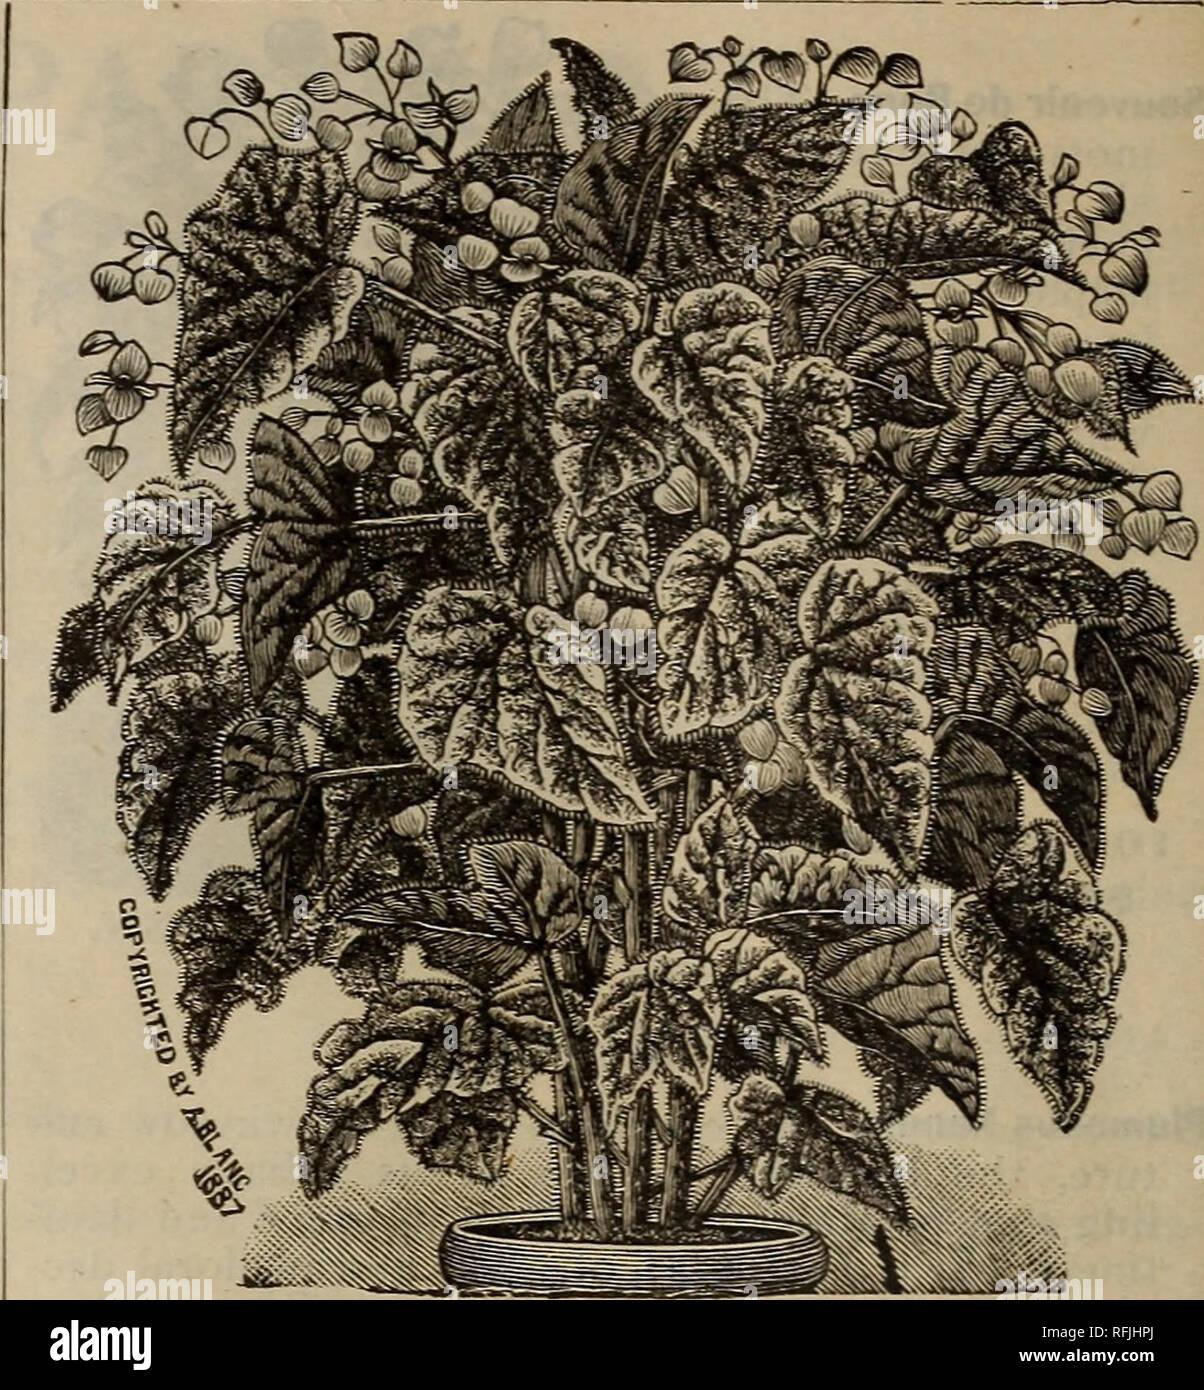 . Spring 1899. Nursery stock Ohio Catalogs; Vegetables Seeds Catalogs;  Flowers Catalogs; Bulbs (Plants) Catalogs; Plants, Ornamental Catalogs; ...